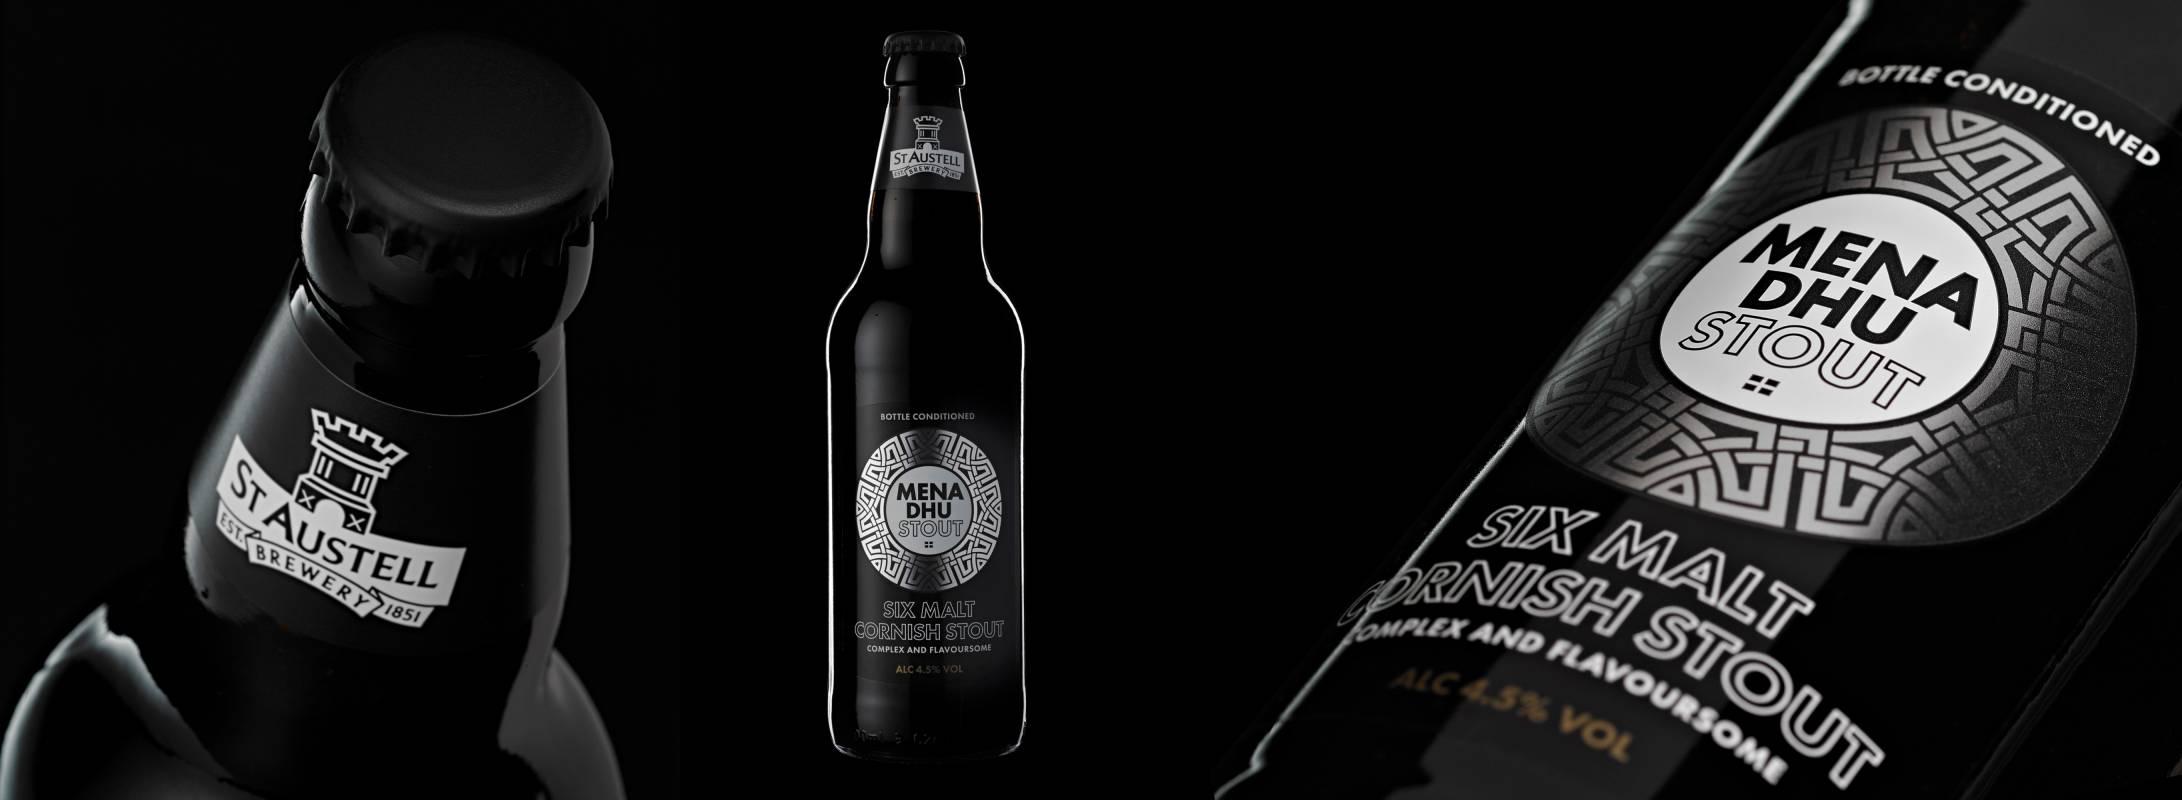 St Austell Mena DHU six malt Cornish stout bottles